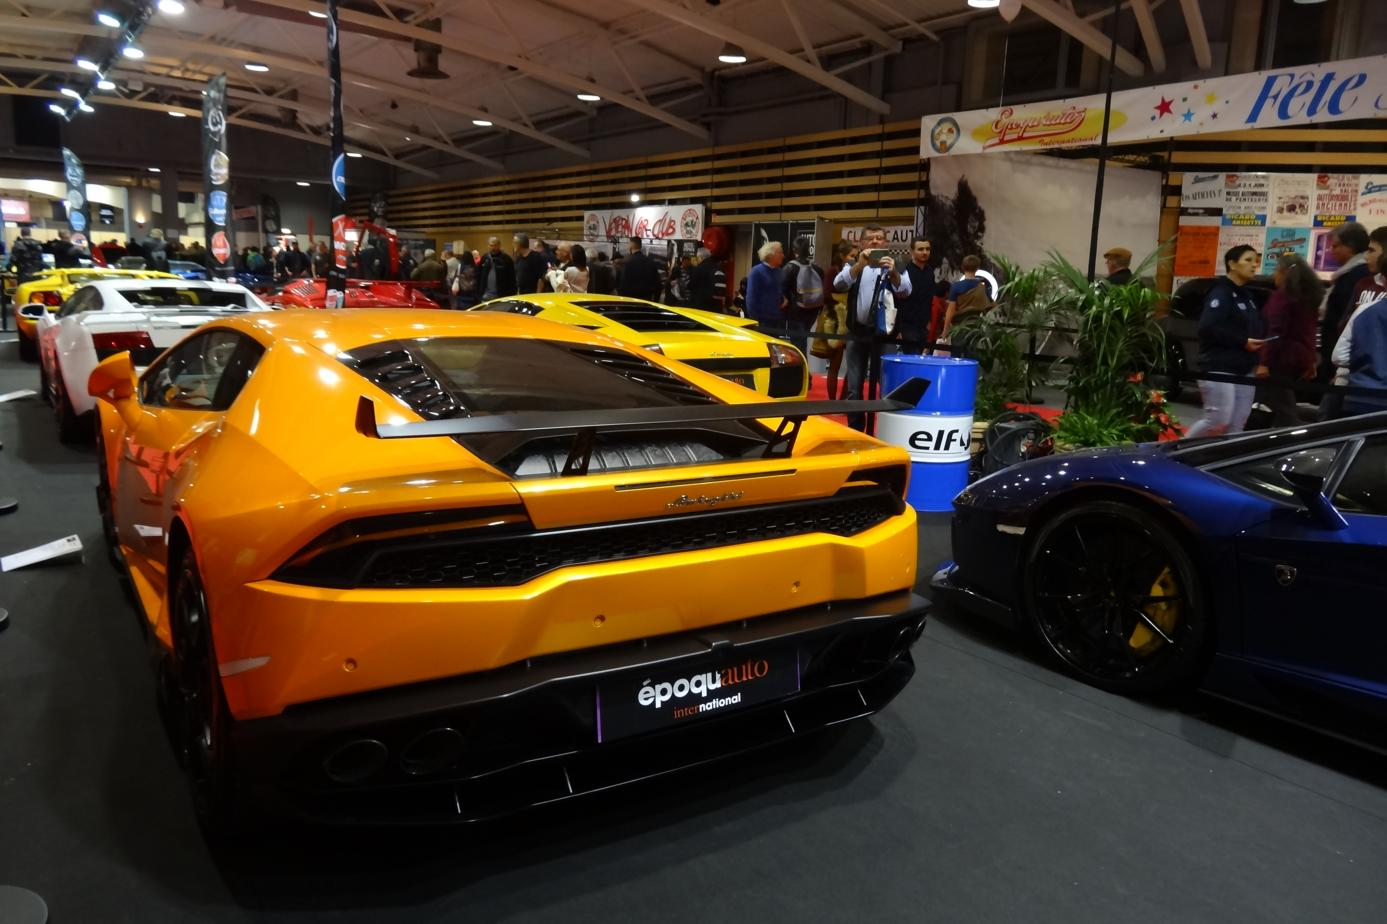 18 EpoquAuto Expo Lamborghini 3